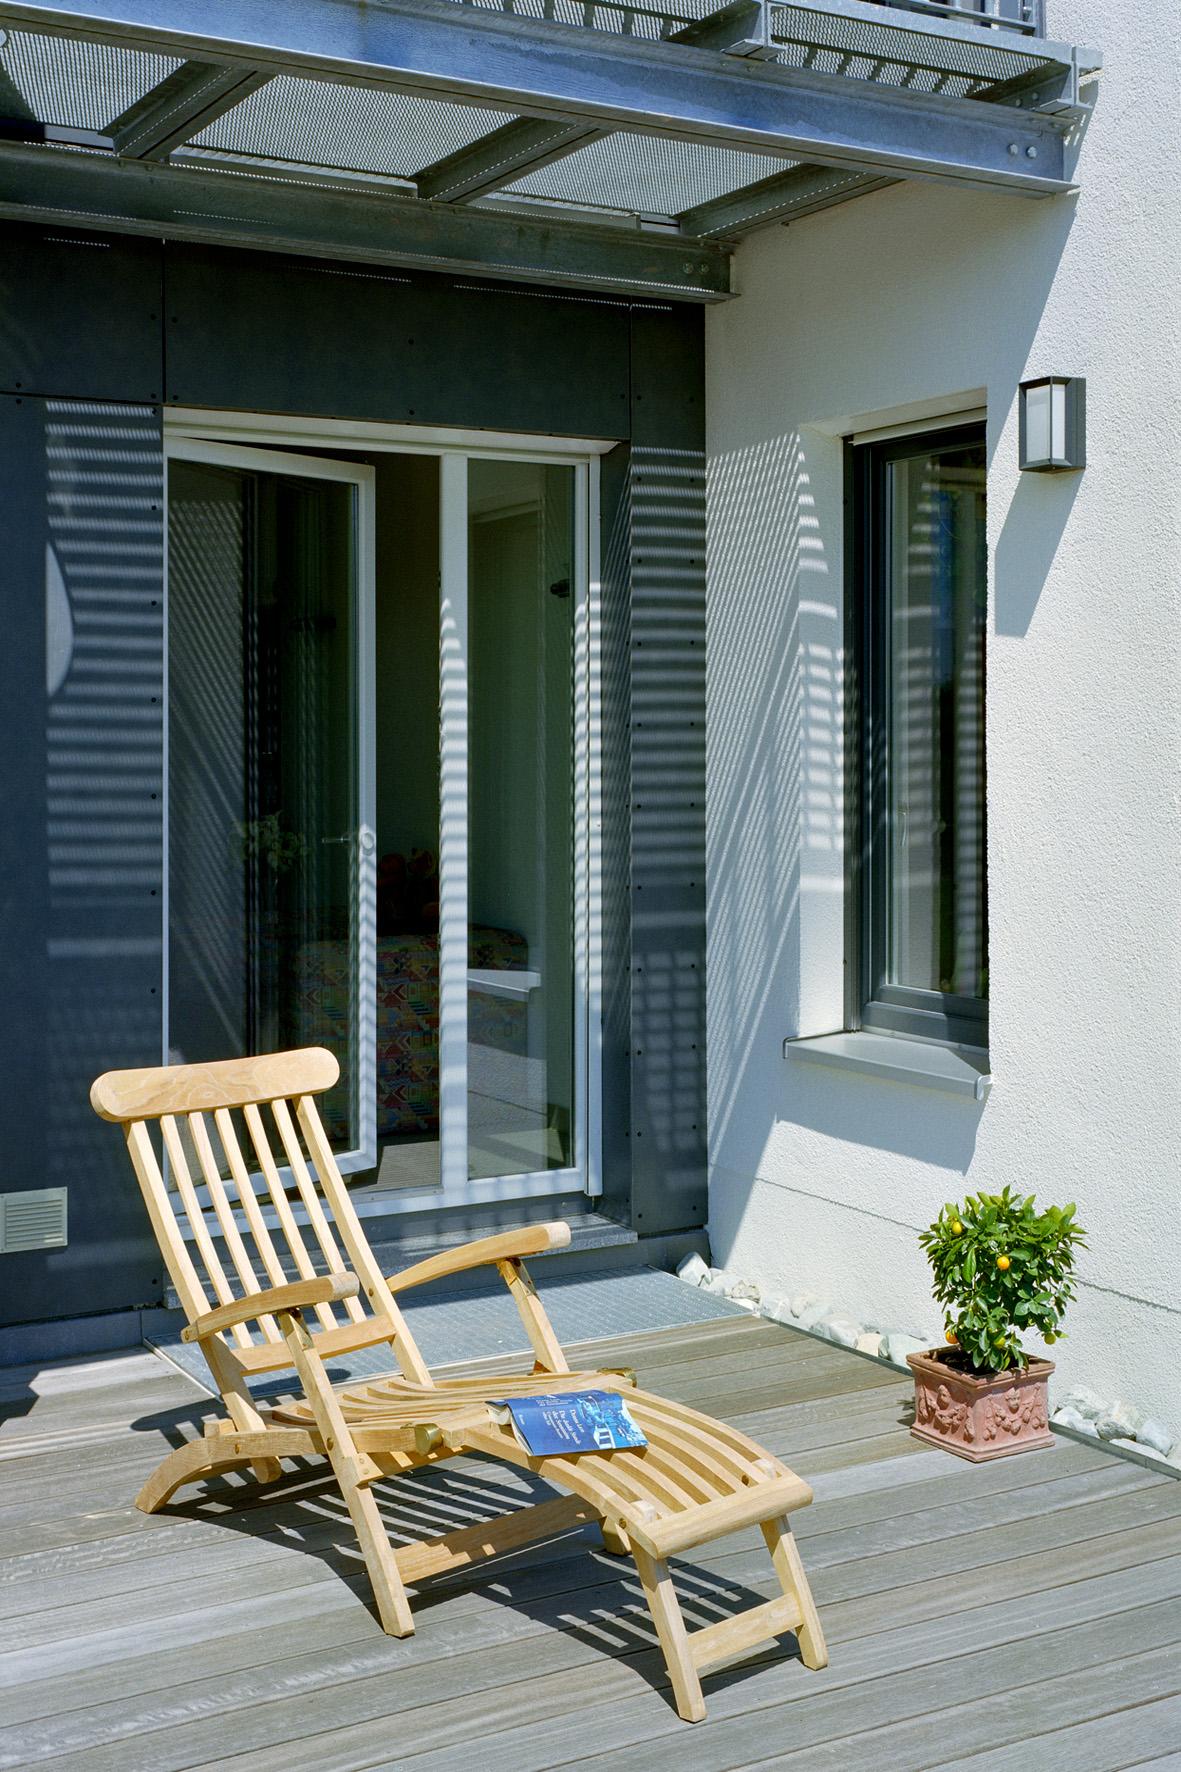 wilken gmbh elemente wintergartenbau in wiesmoor. Black Bedroom Furniture Sets. Home Design Ideas